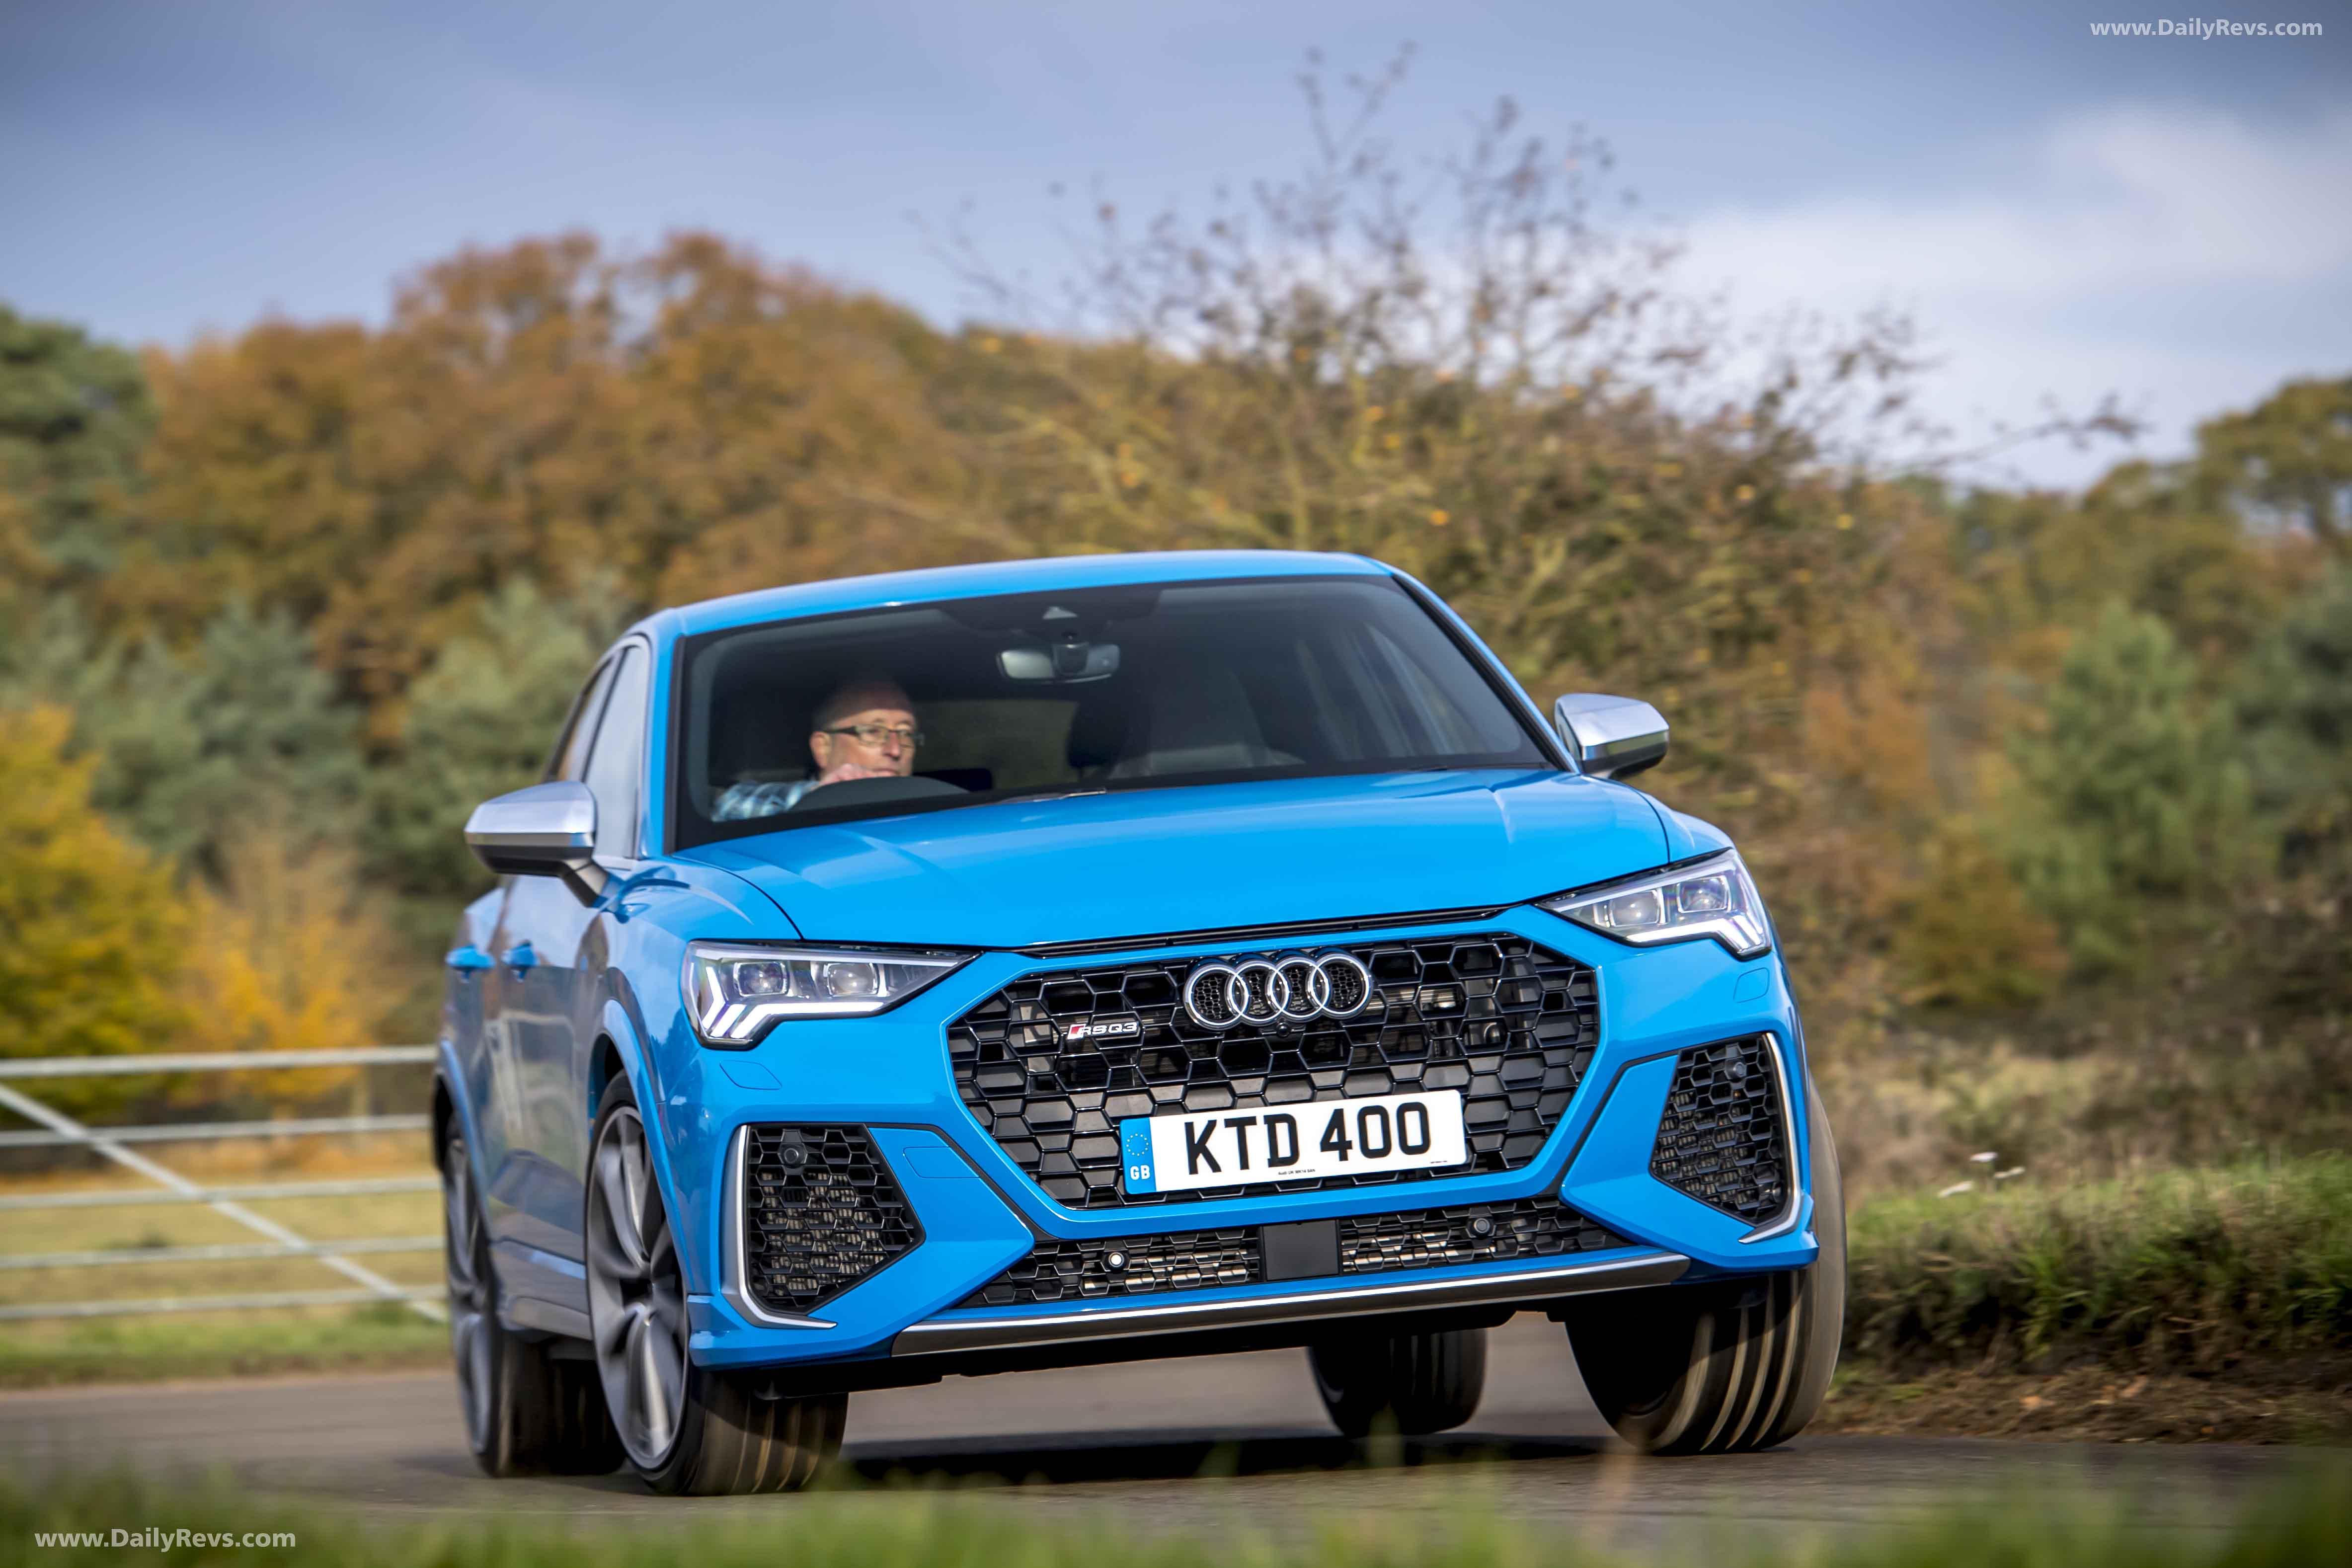 2020 Audi RS Q3 Sportback UK - HD Pictures, Videos ...